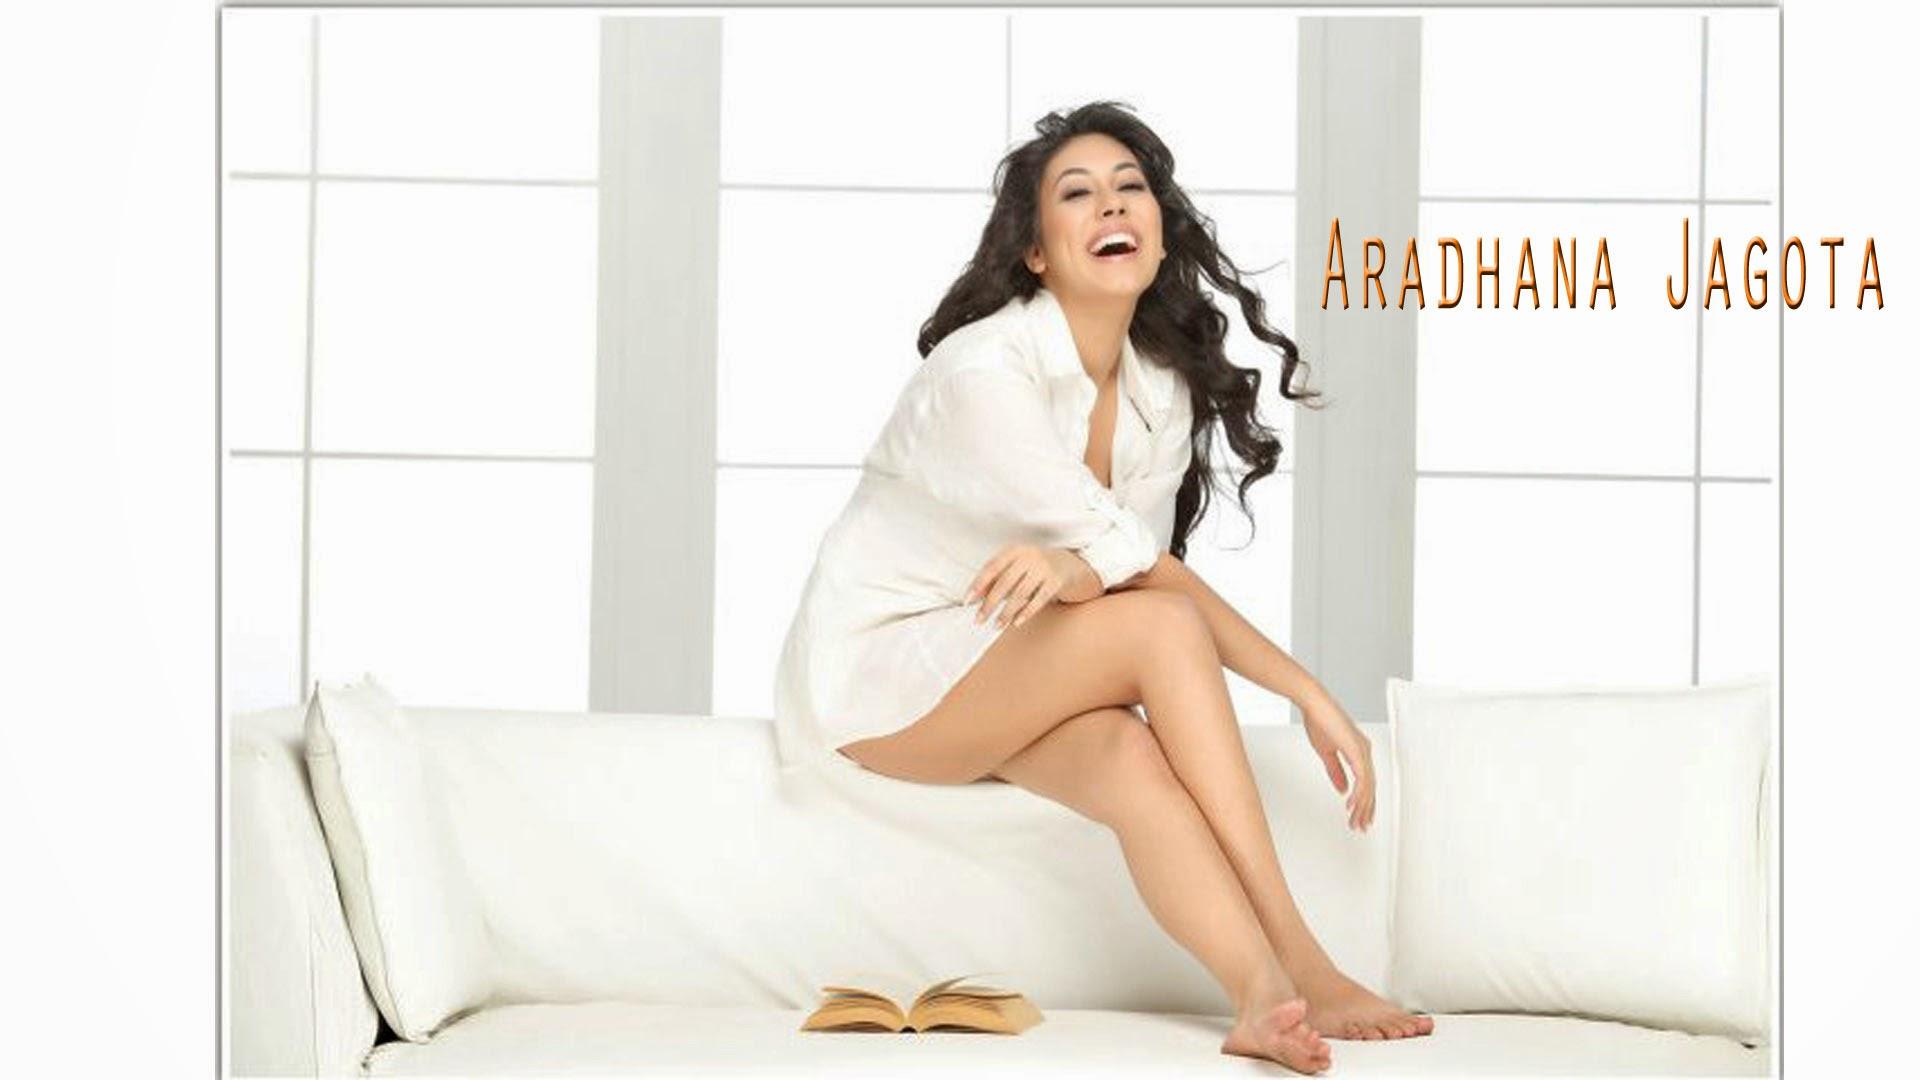 Aradhana Jagota hot and spicy pics